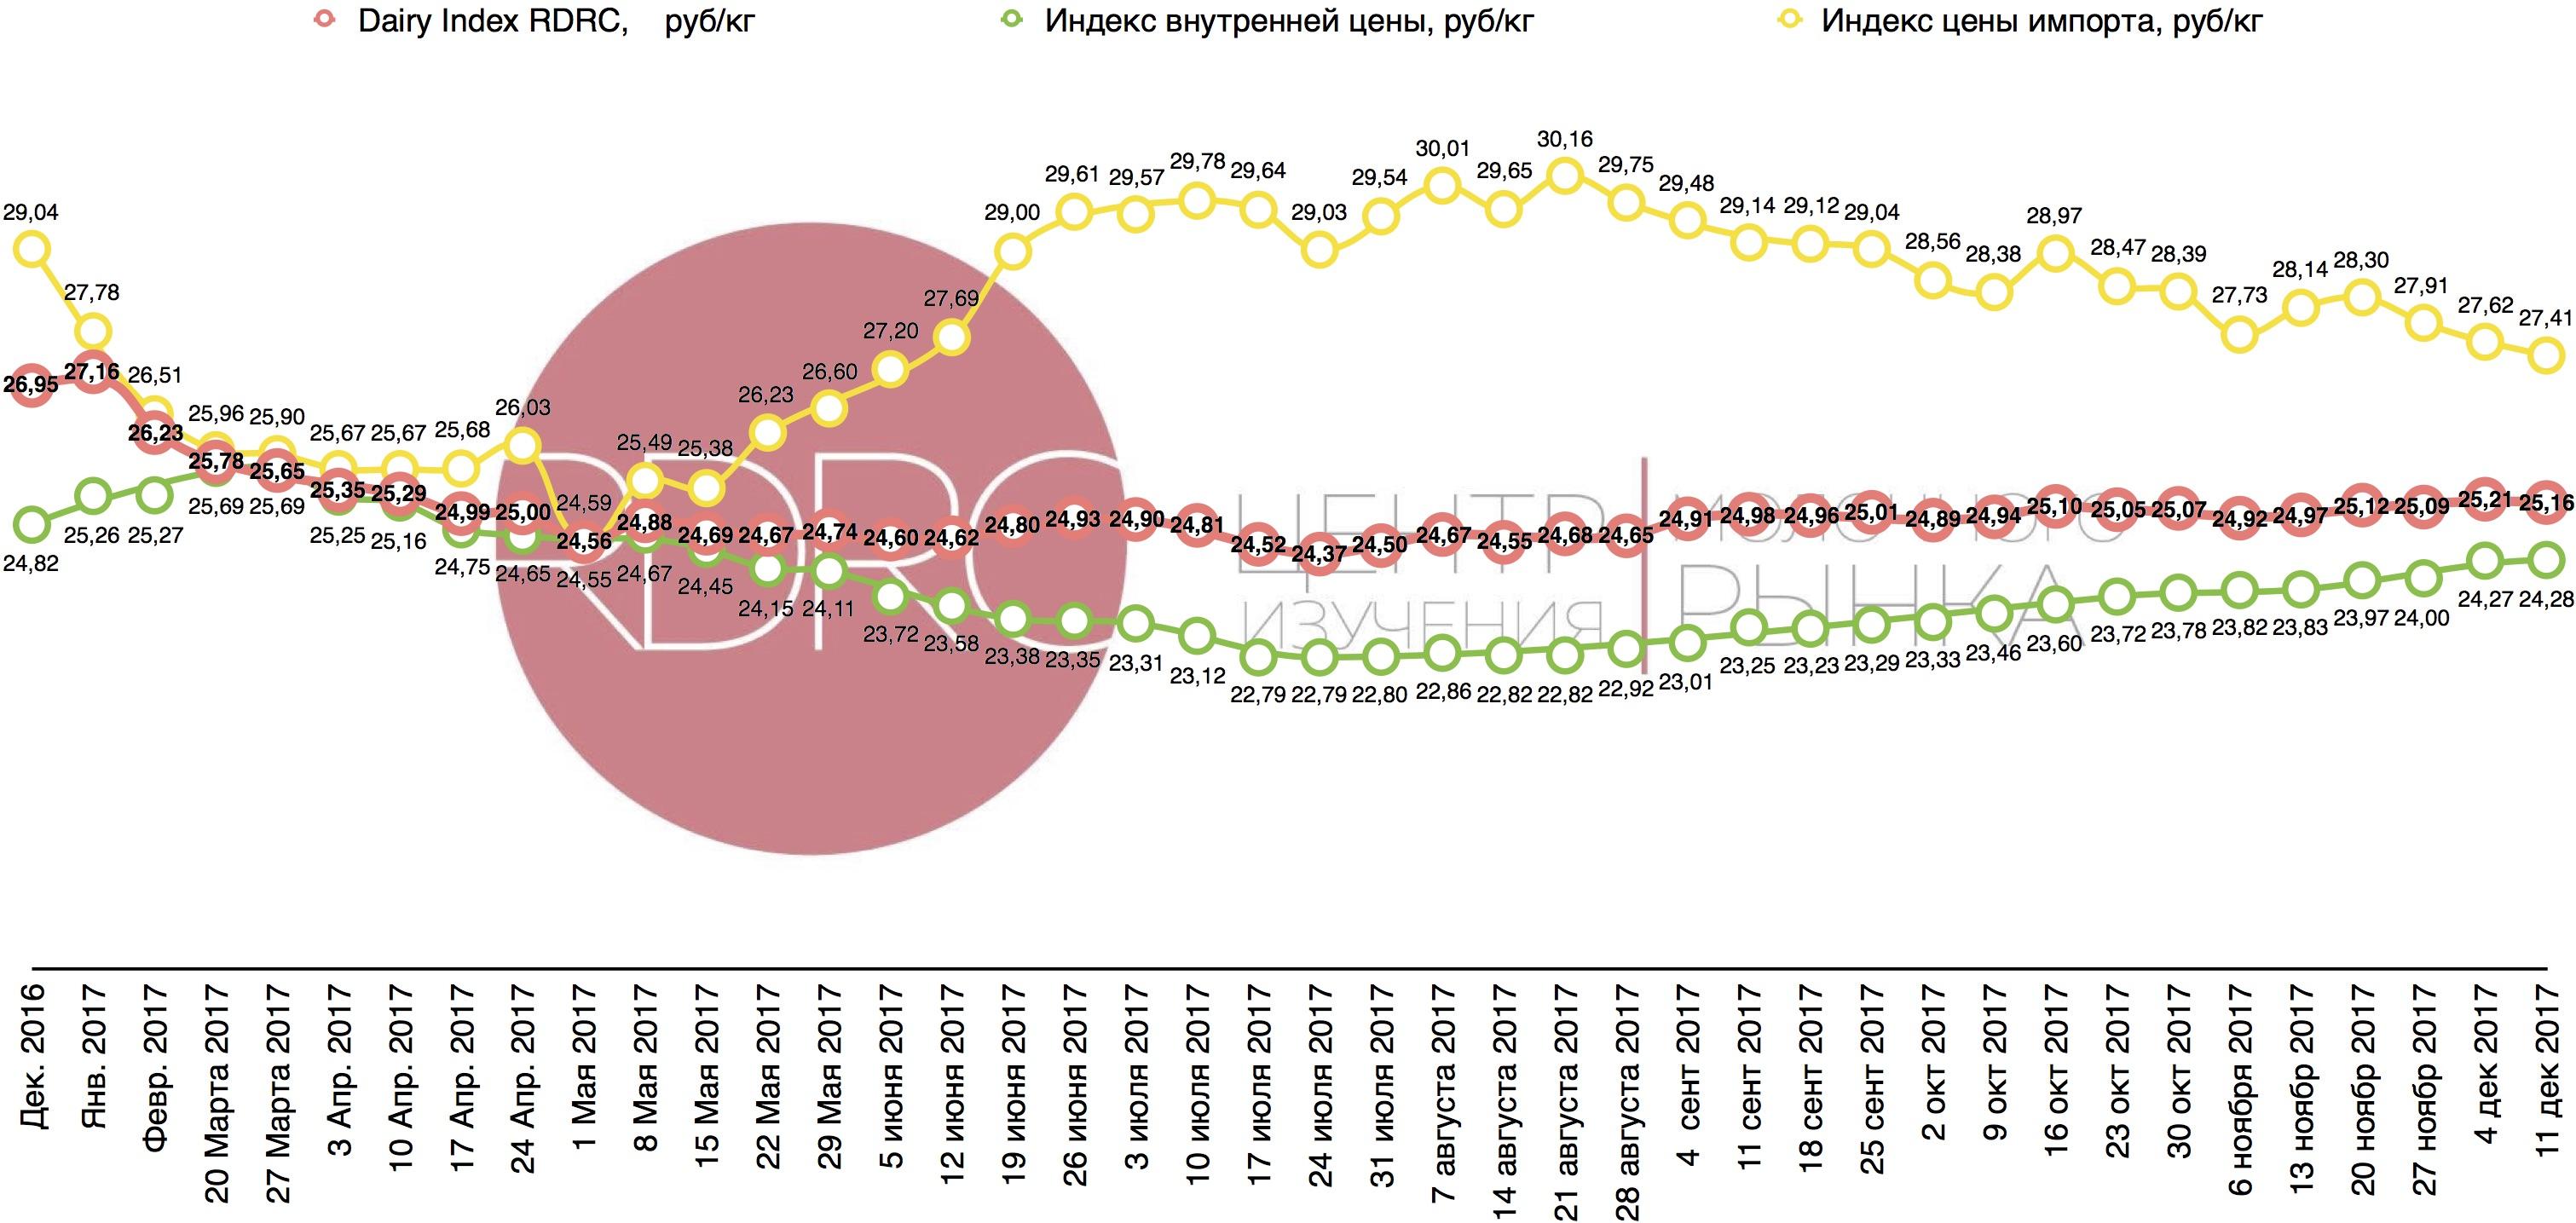 http://www.dairynews.ru/news-image/2017/June/20170629/индекс%2011%20дек%20-1.jpg